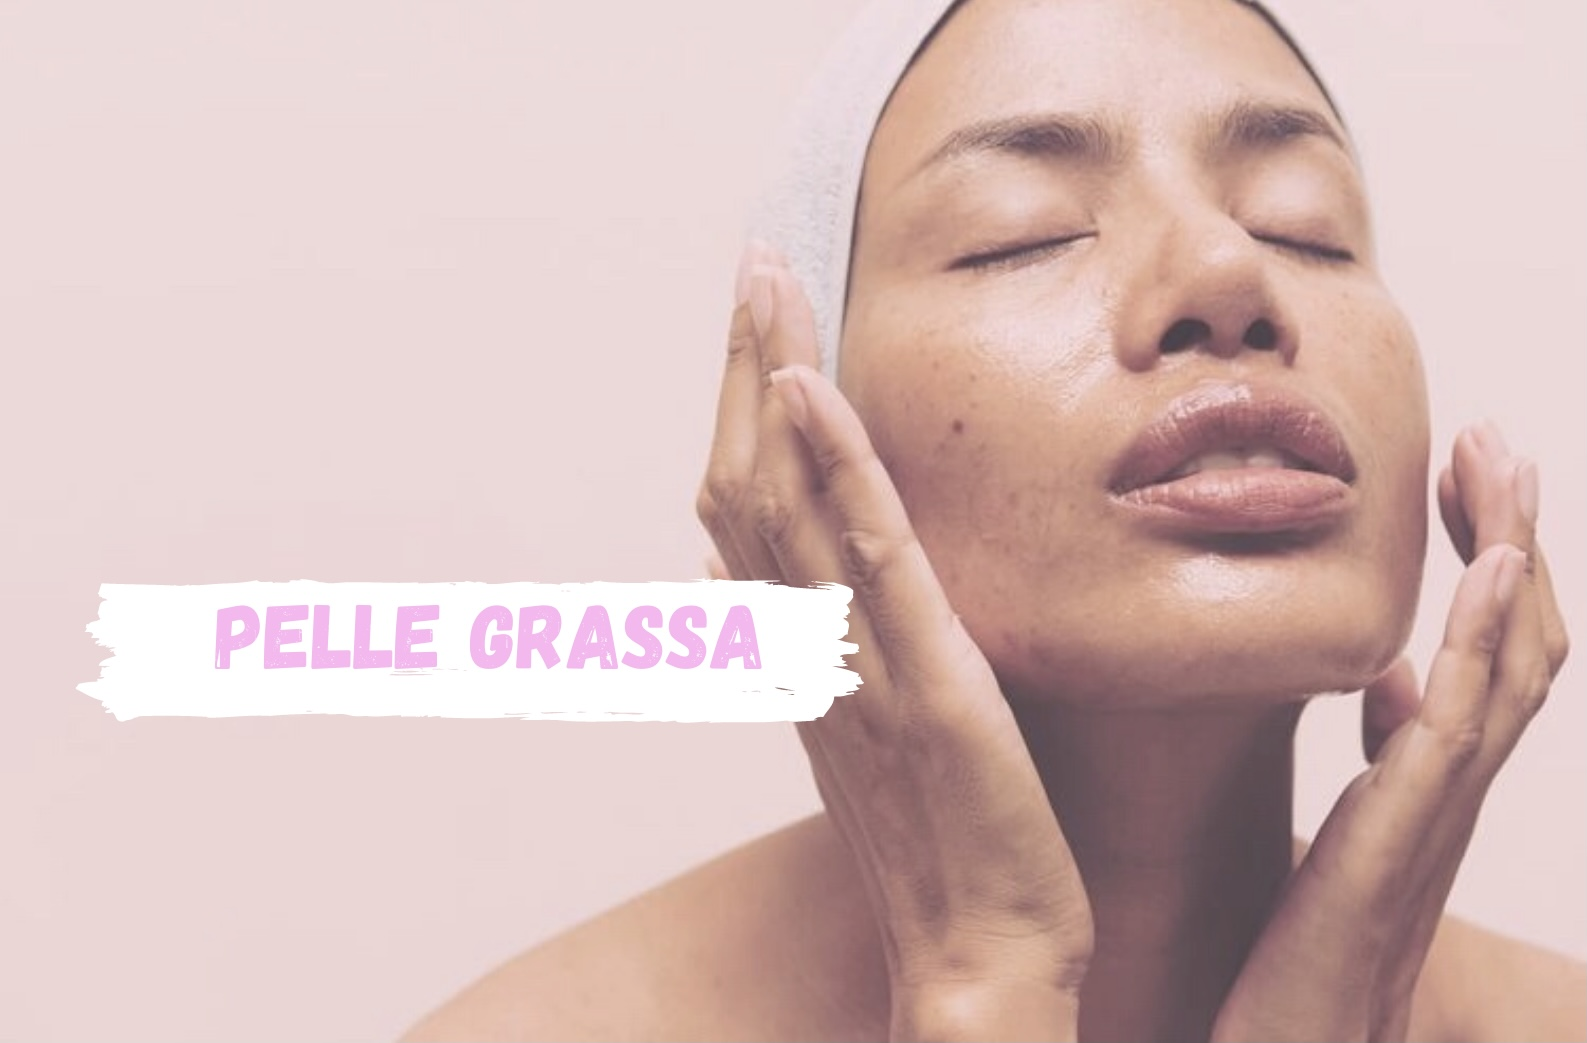 Pelle Grassa